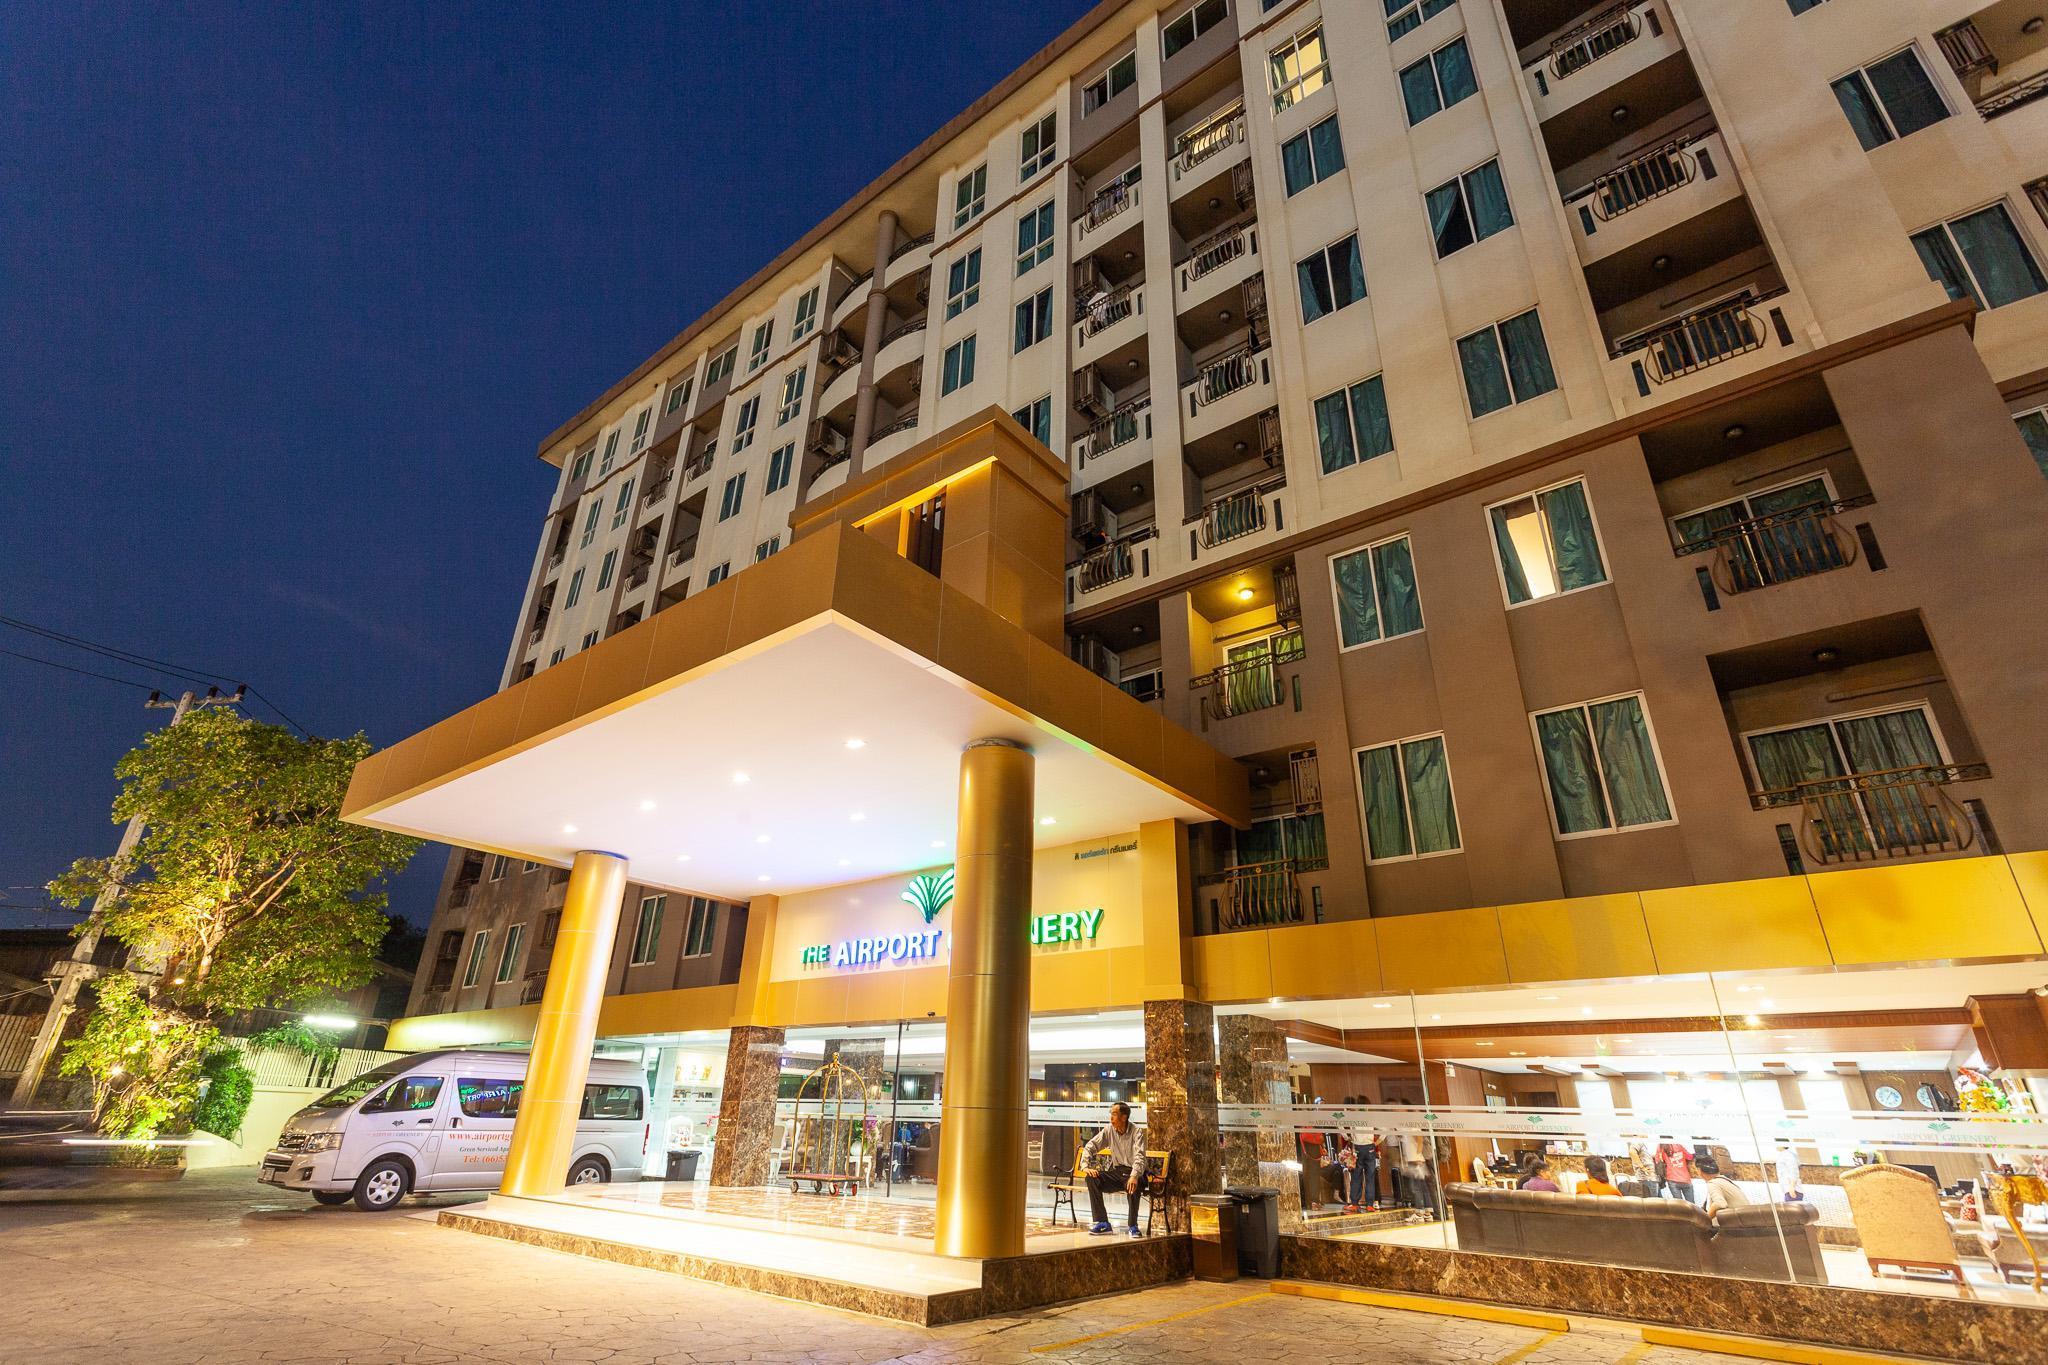 airport greenery hotel serviced apartment in chiang mai room rh agoda com